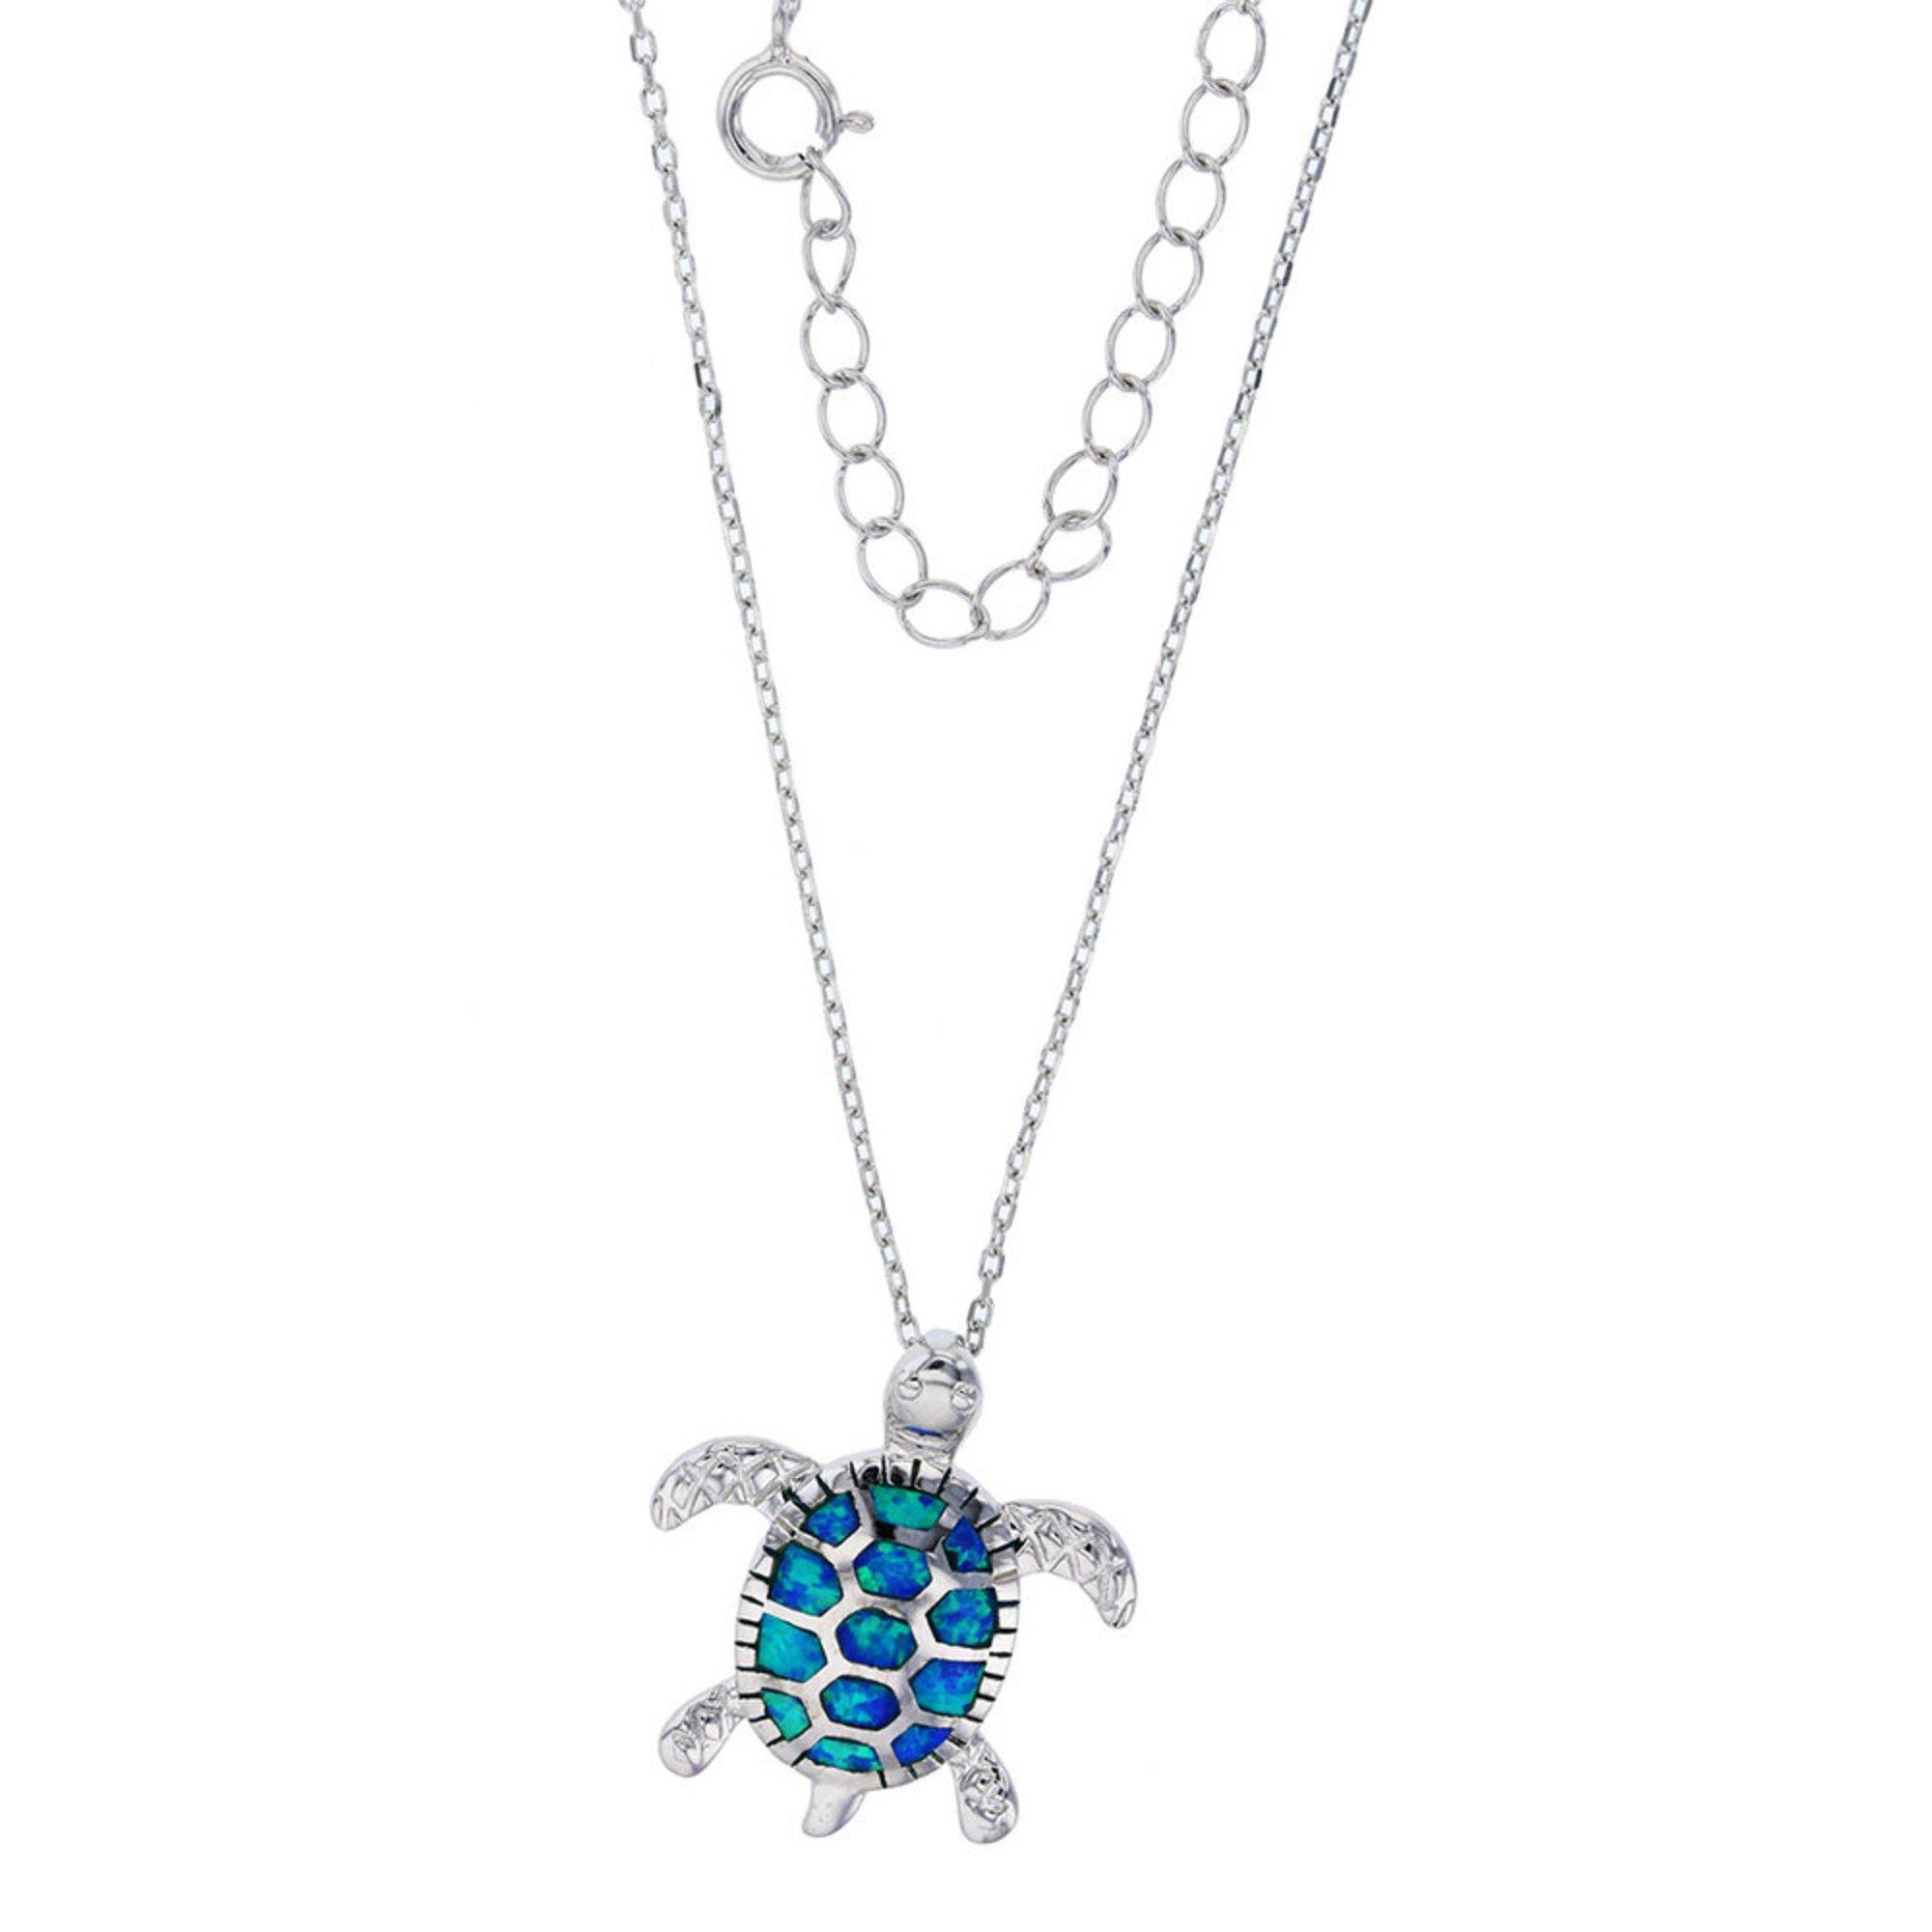 Bijoux Du Soleil Created Opal Turtle Pendant, Sterling